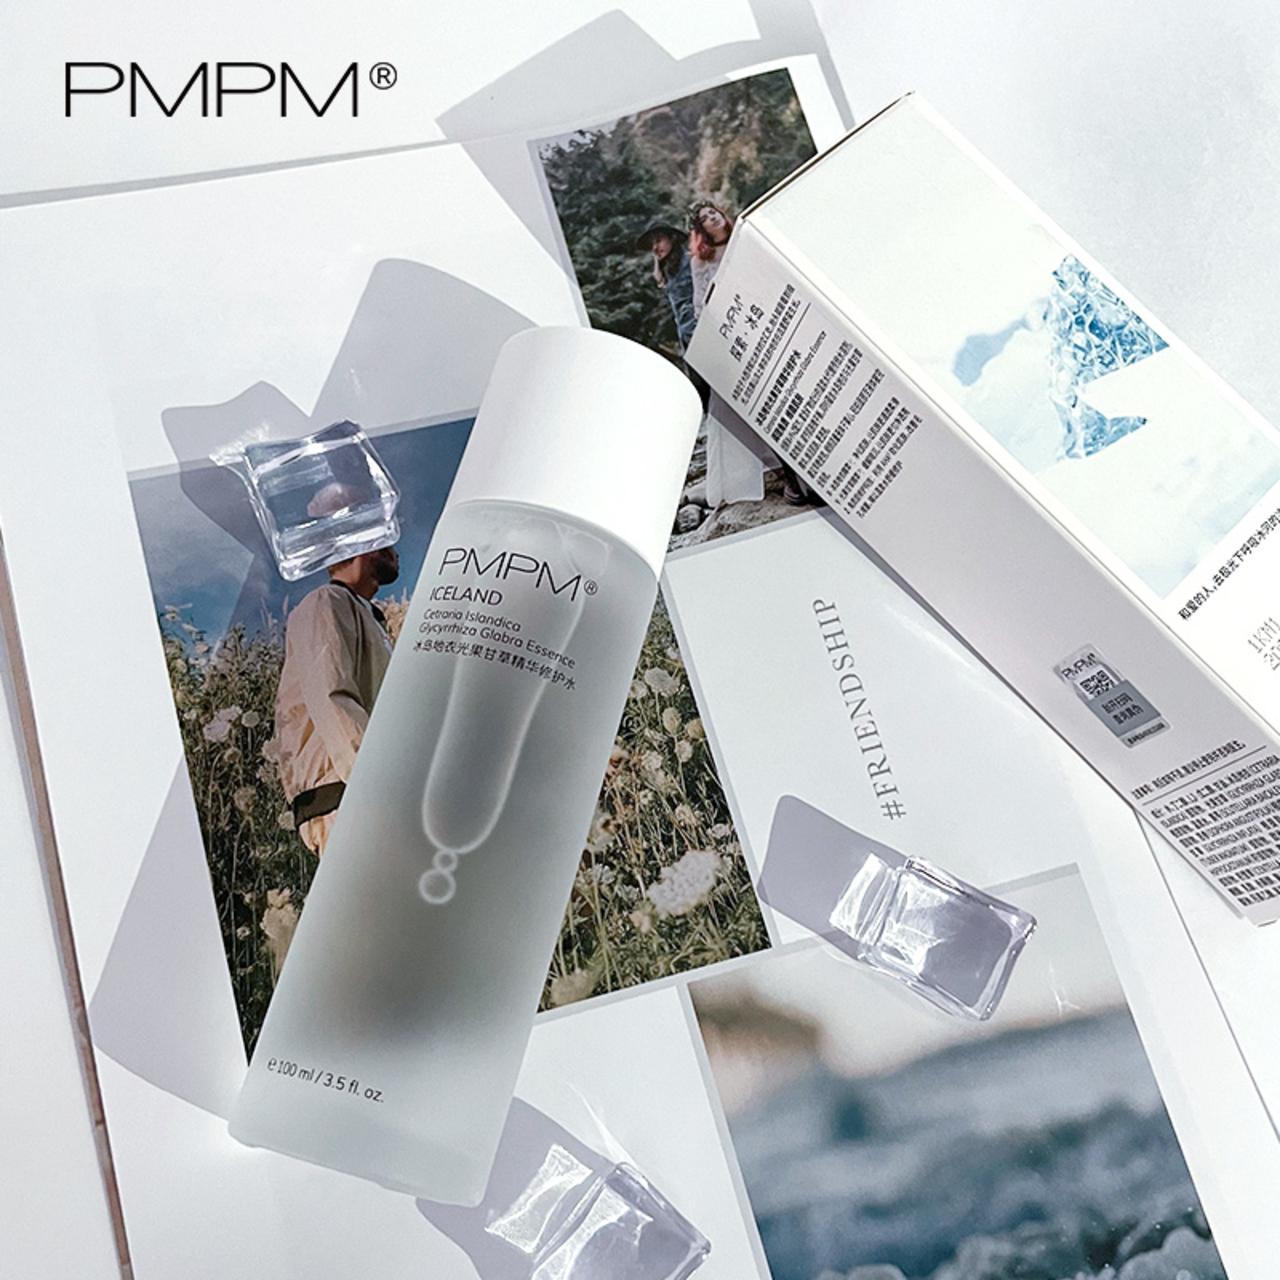 PMPM ICELAND Essence冰岛地衣光果甘草精华修护水100ml